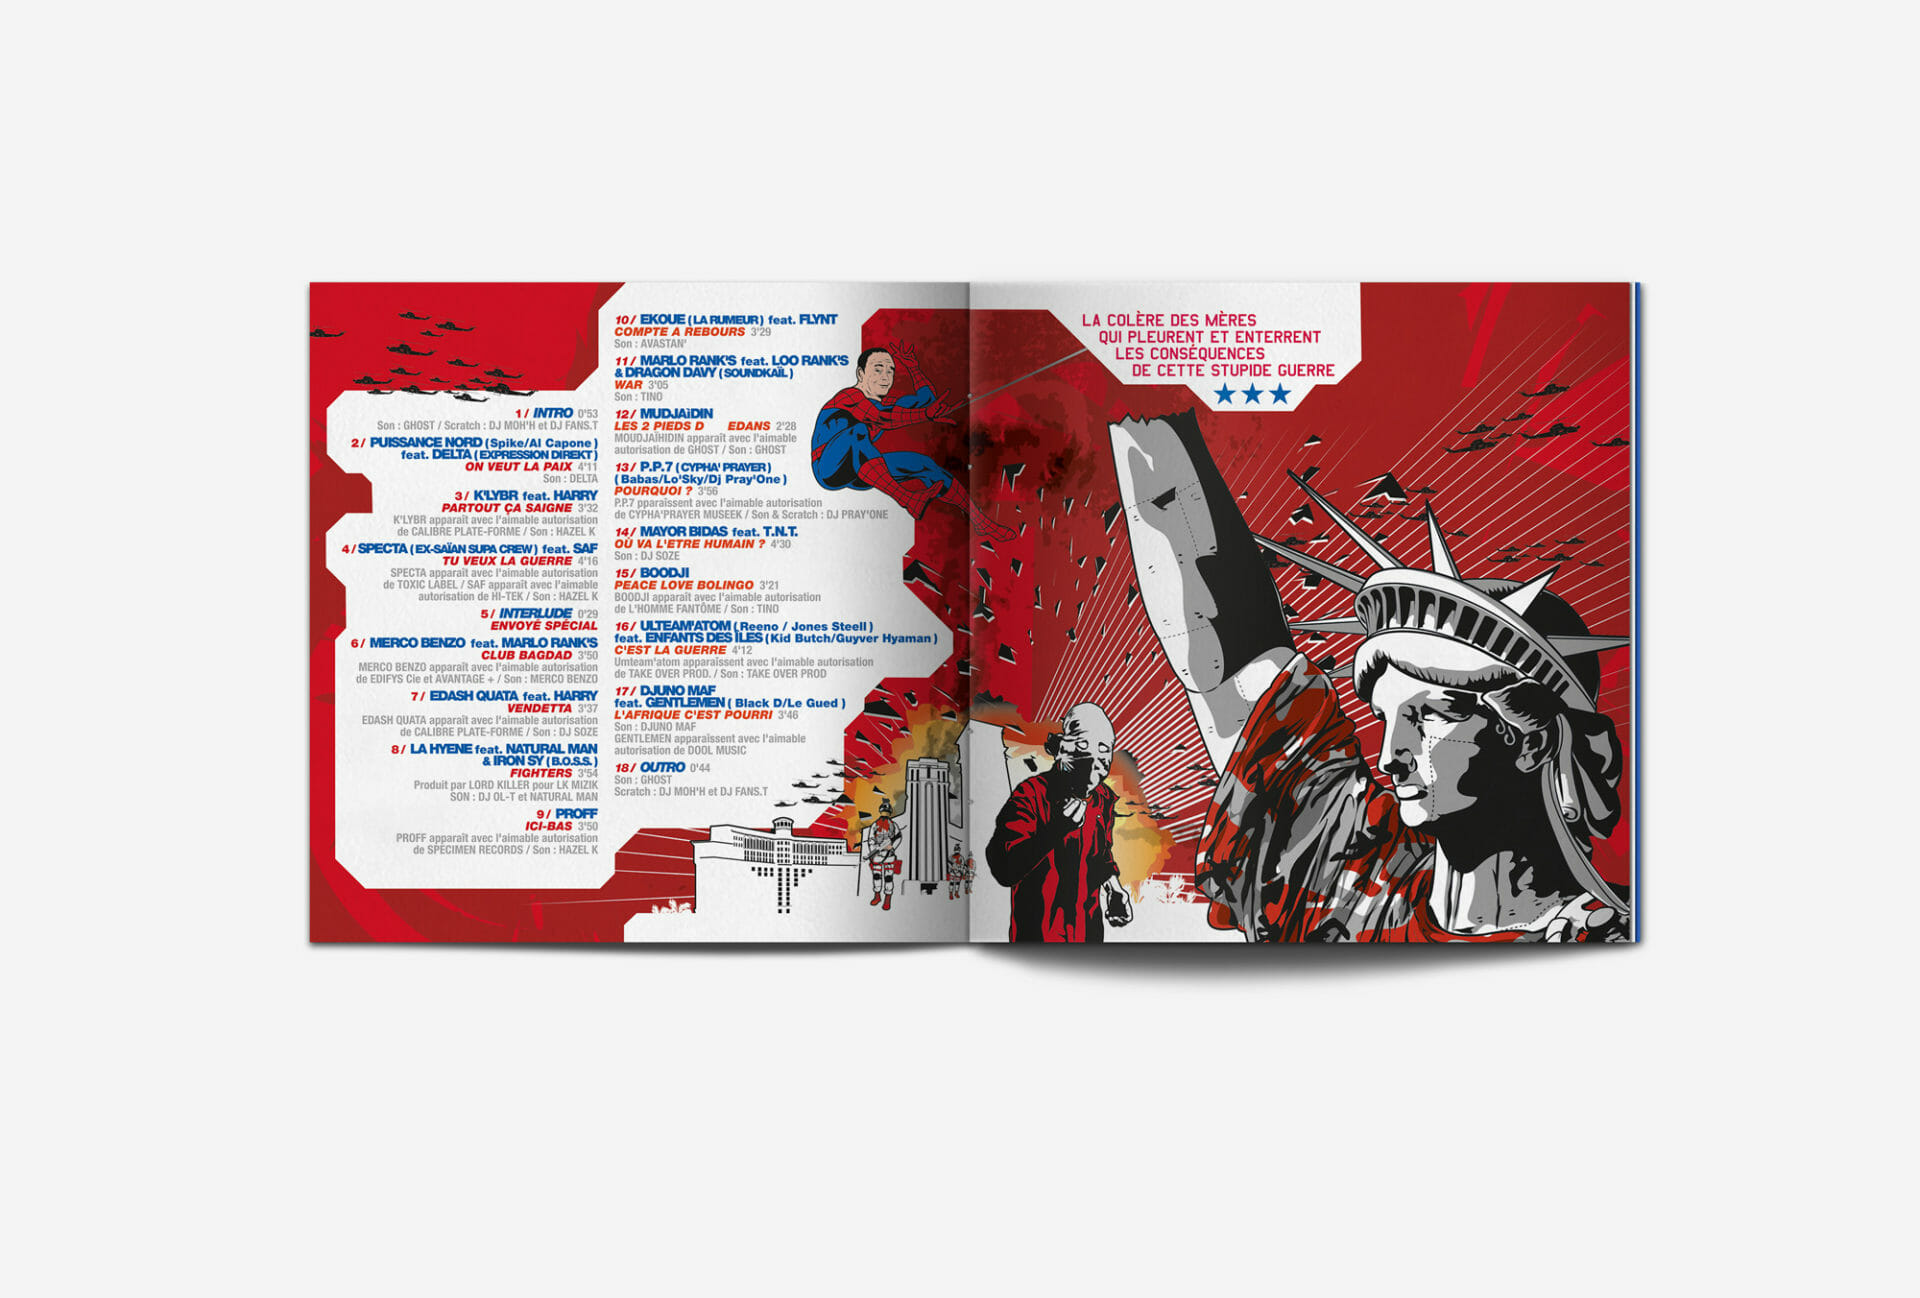 StupidGuerrier-book-cd-05